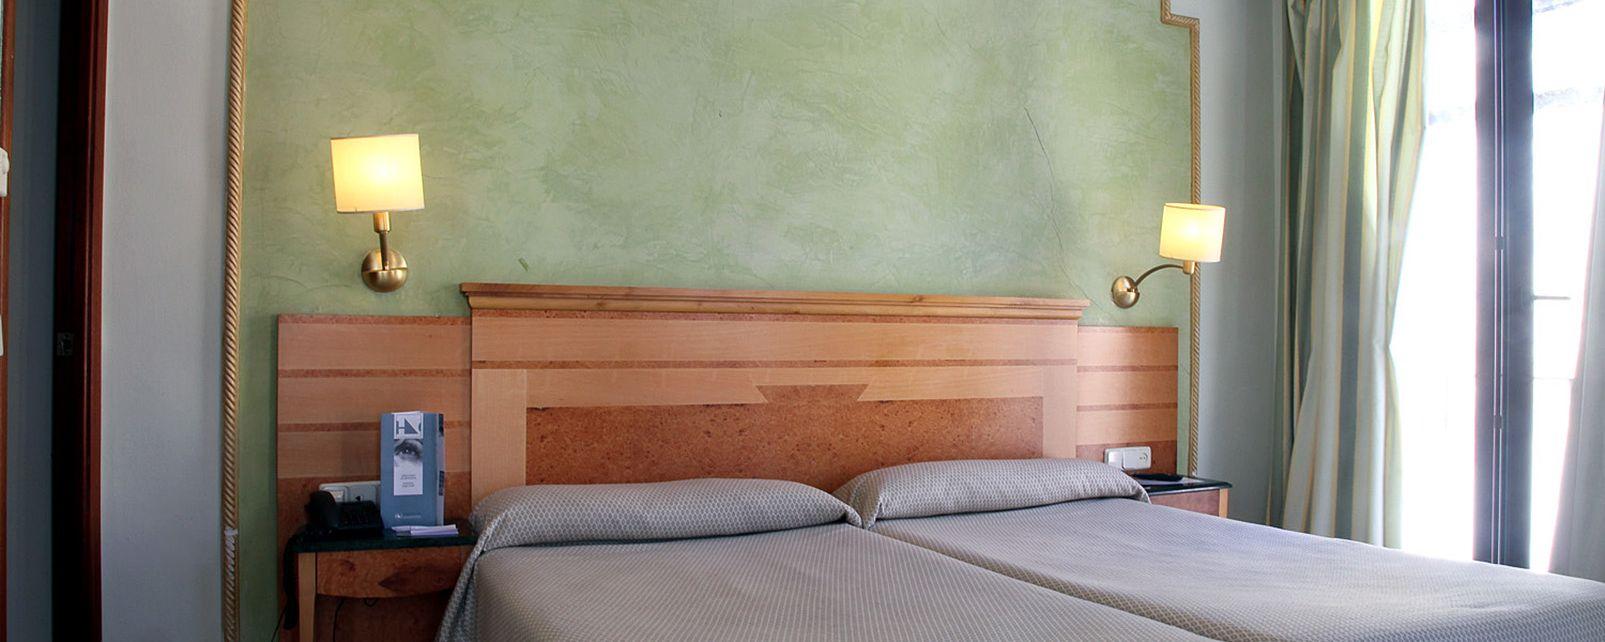 Hotel Eurostars Maimónides